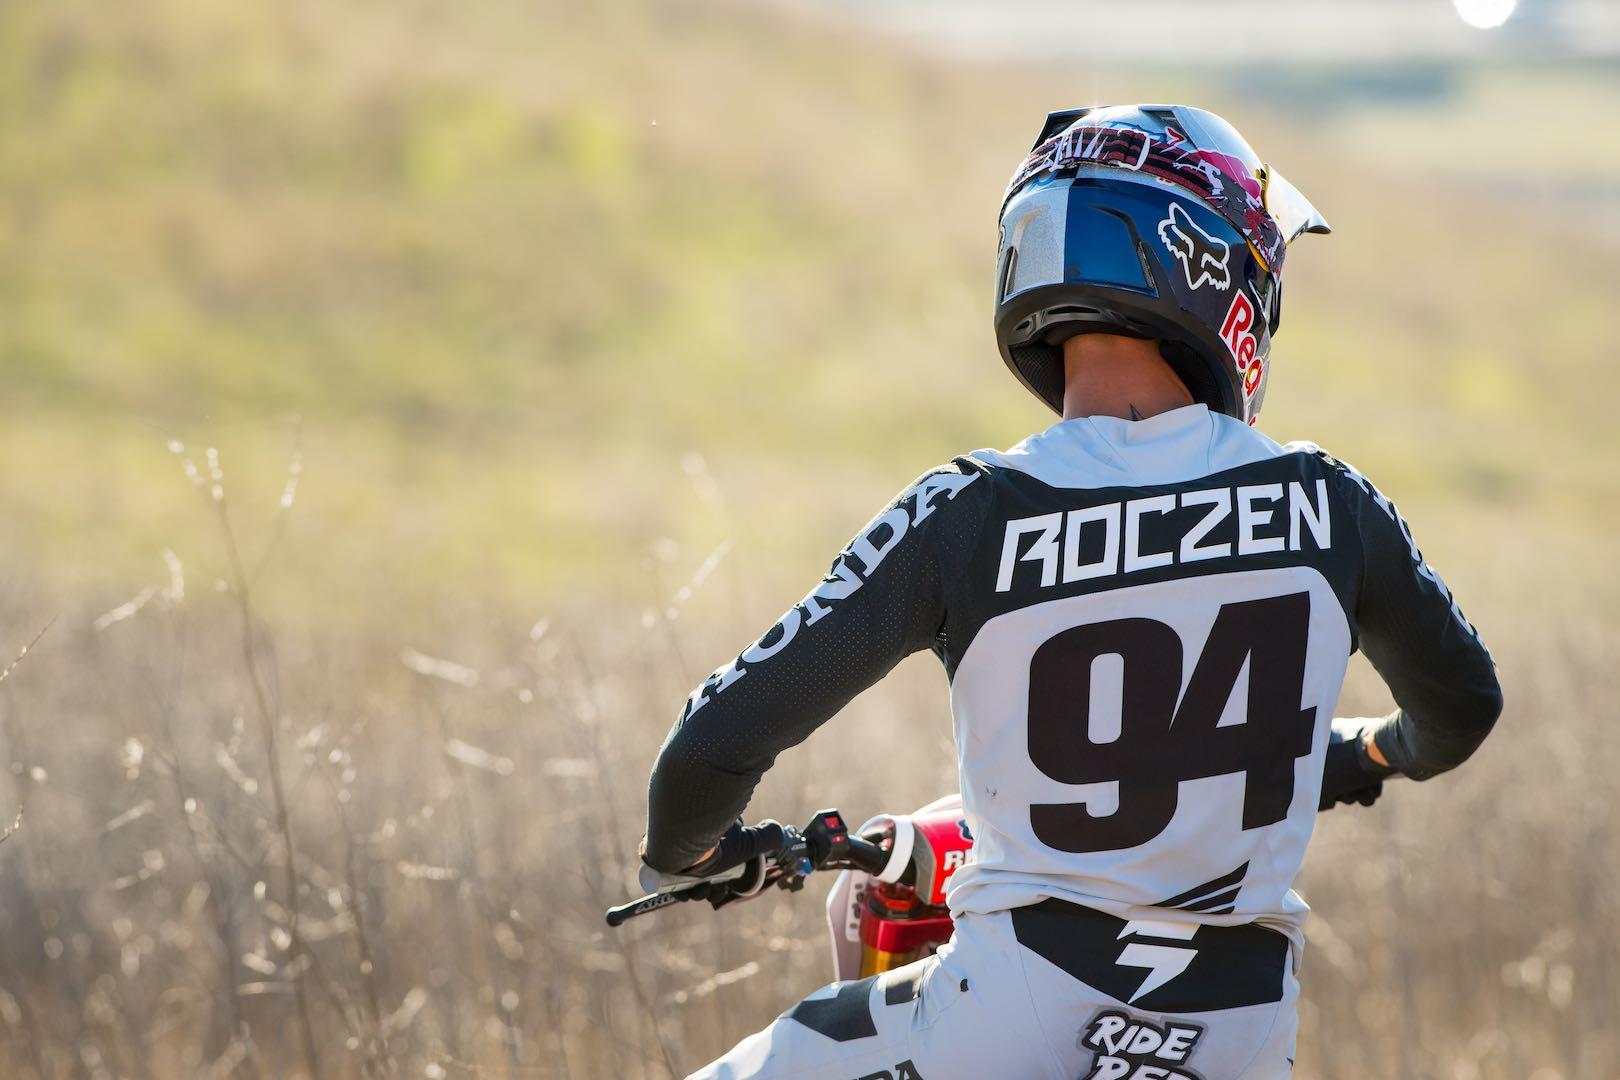 Ken Roczen Anaheim II Supercross Crash Update